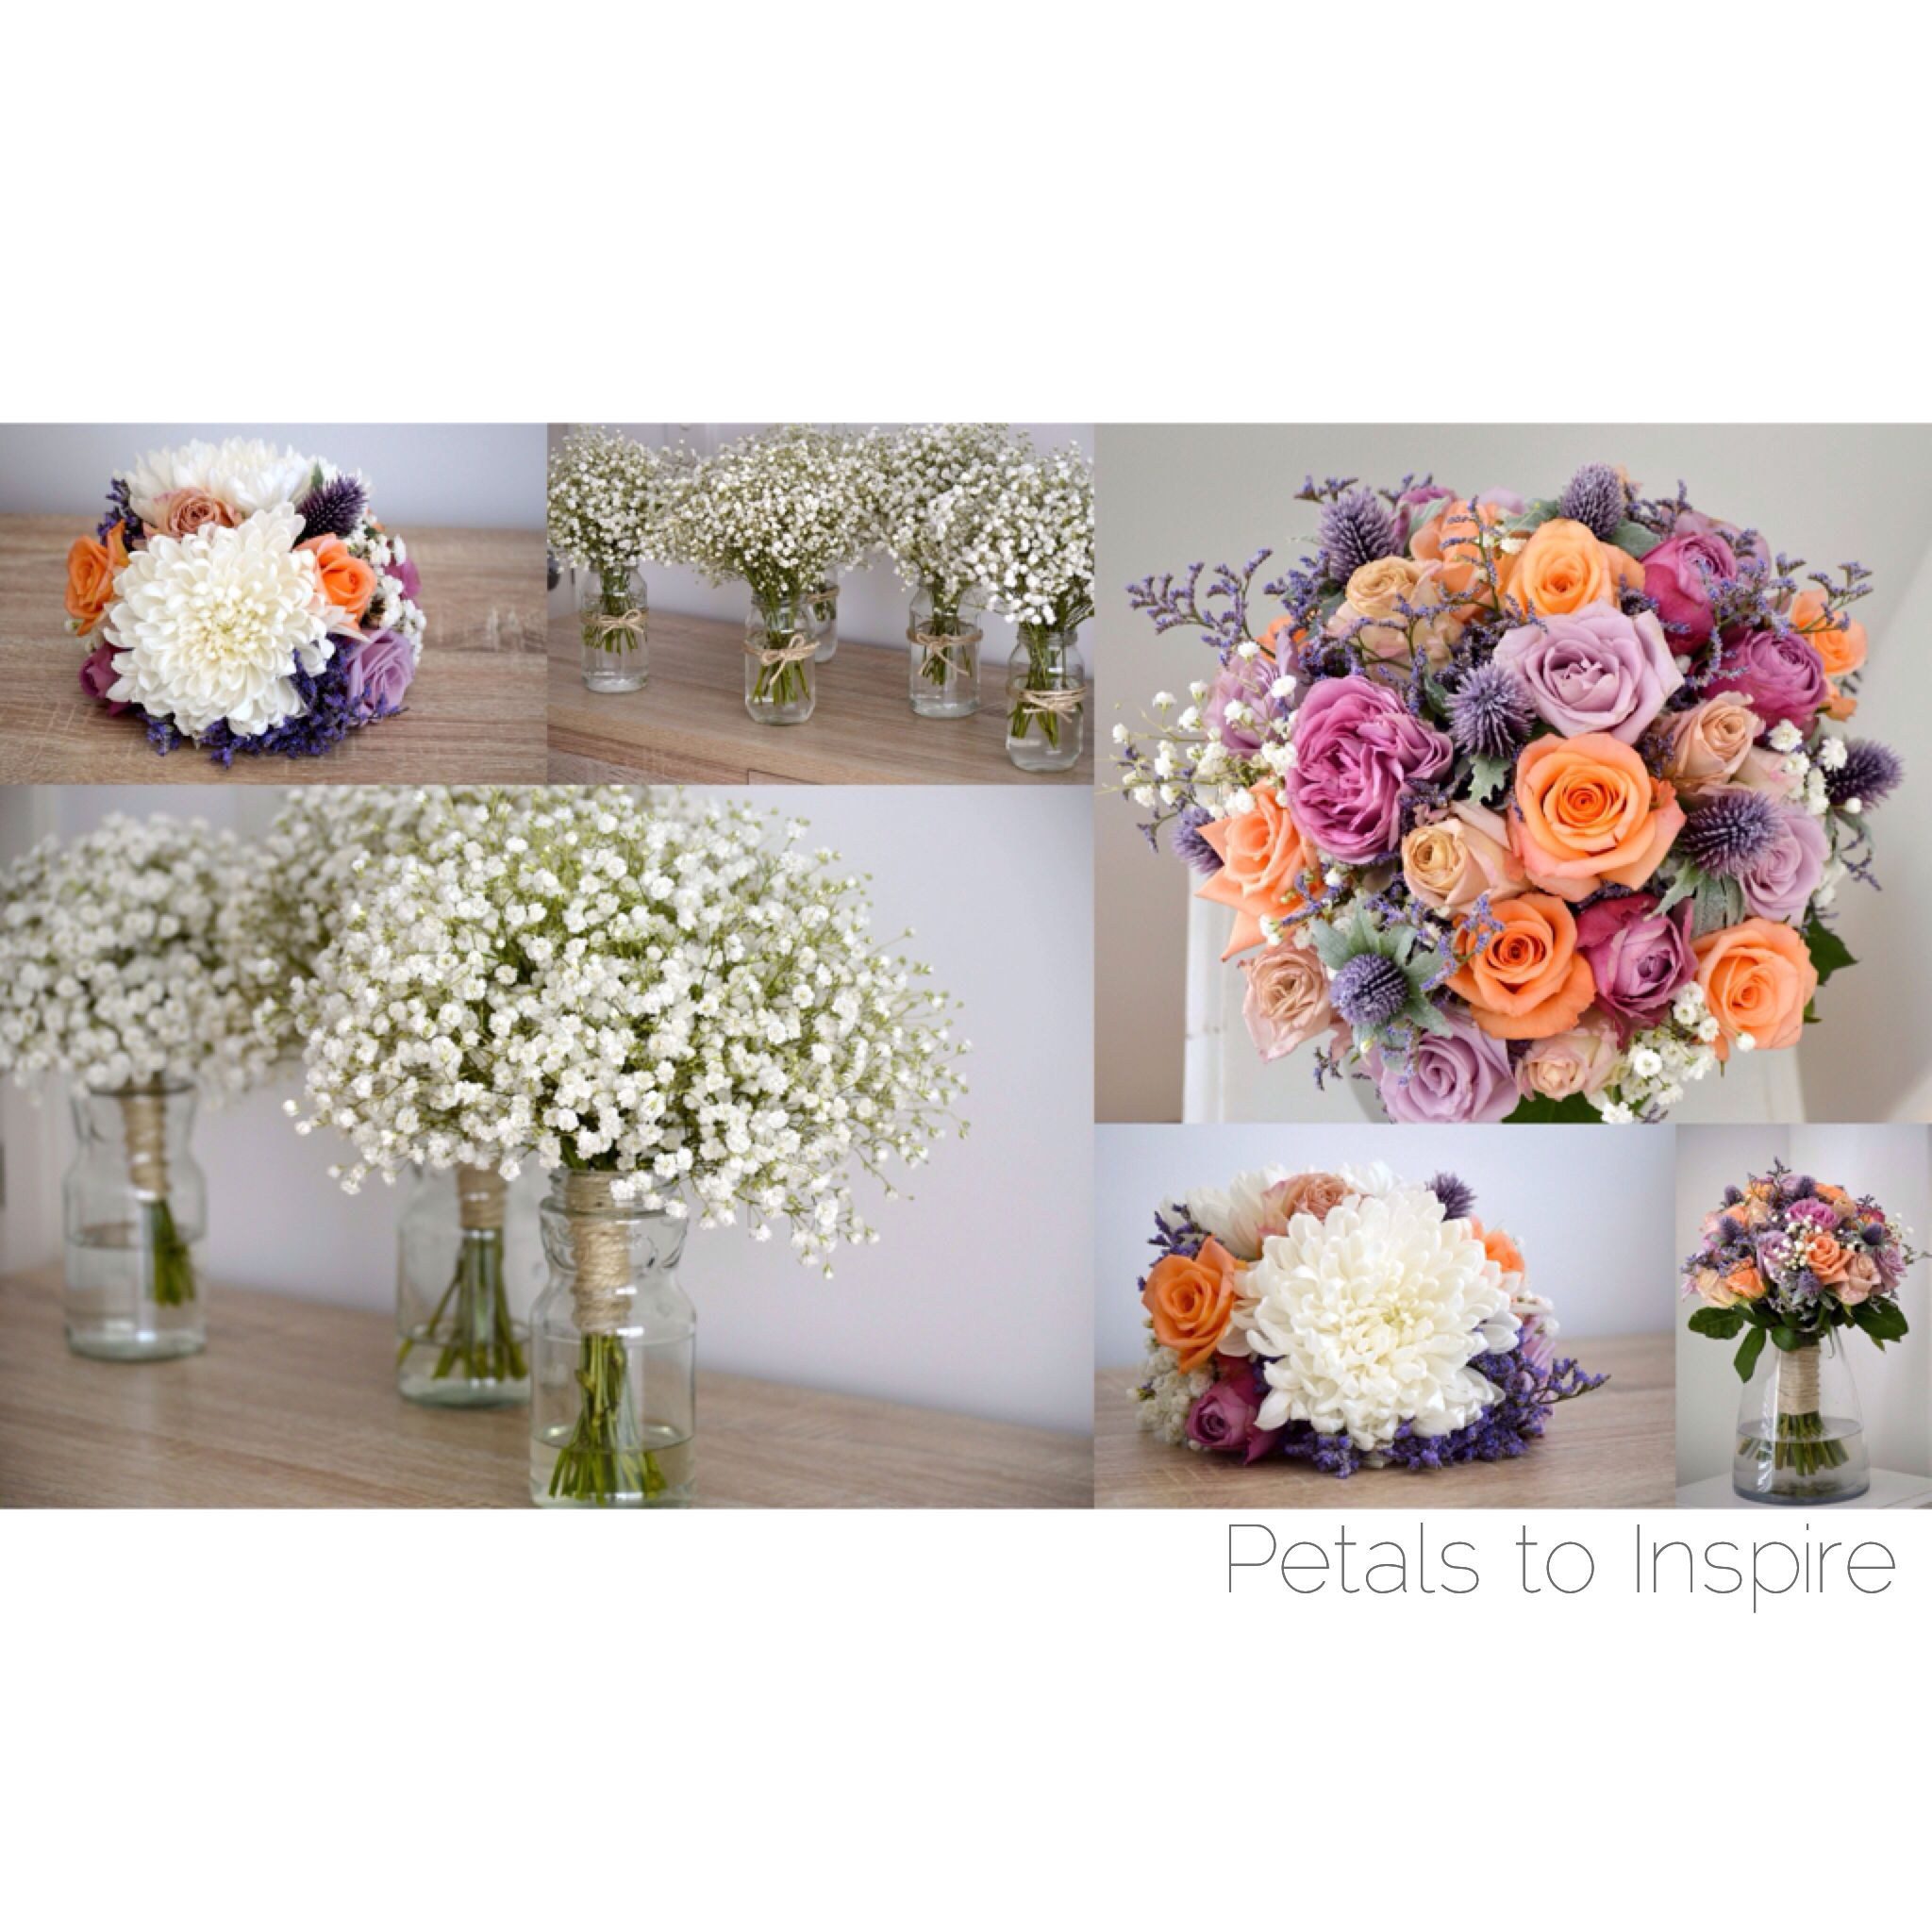 Vintage theme wedding - Peach, orange lilac, purple and white ...